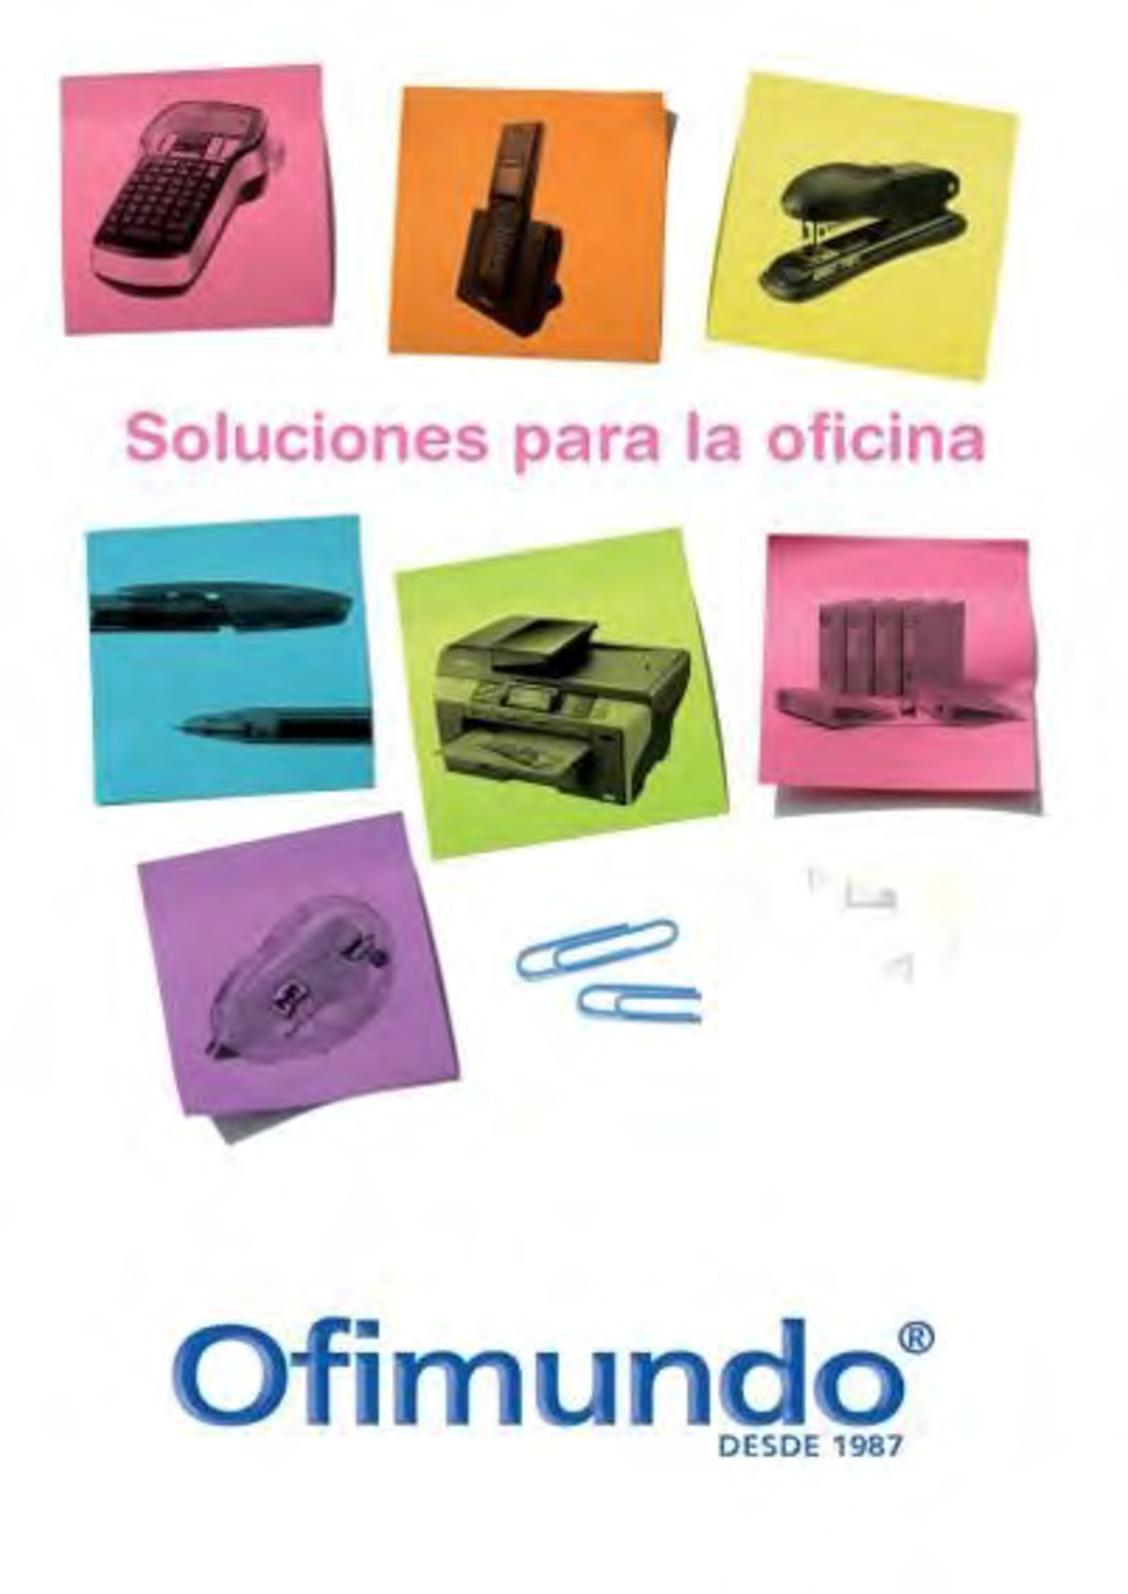 Calaméo - Ofimundo Catálogo General 2018 Parte Nº 1 5d368d7127957